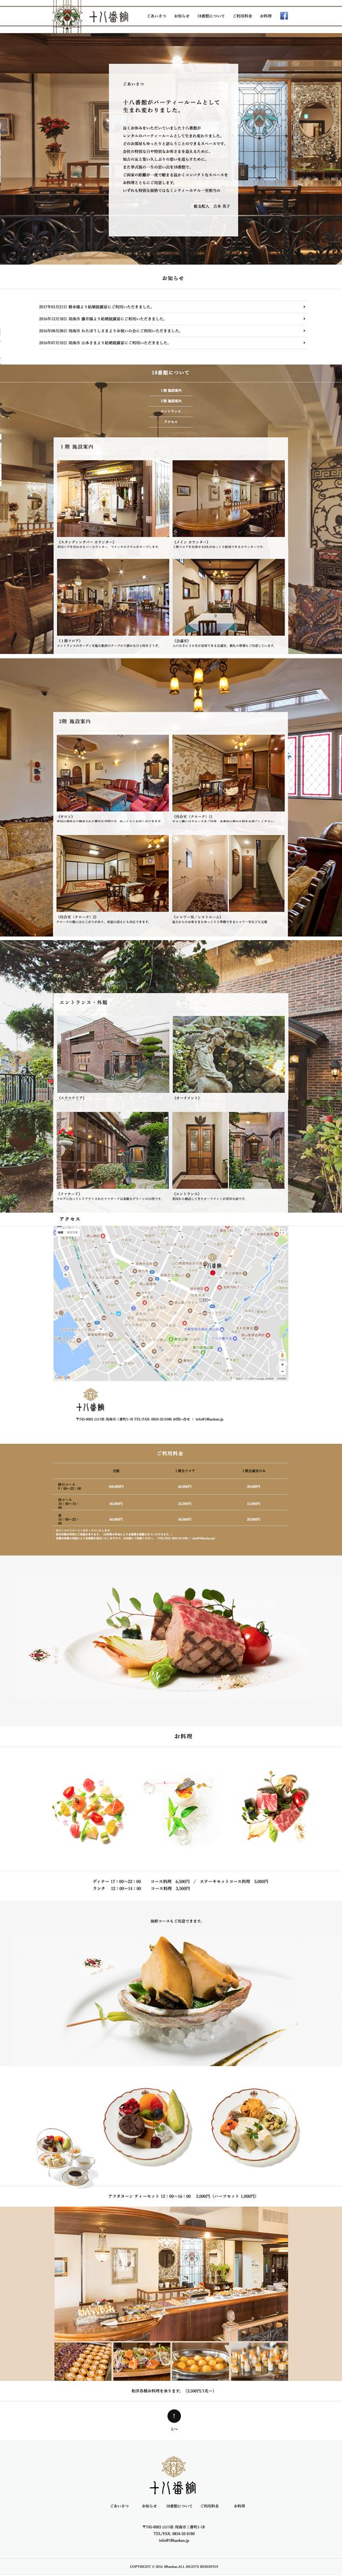 WEBサイト|デザインmap|レシピ撮影